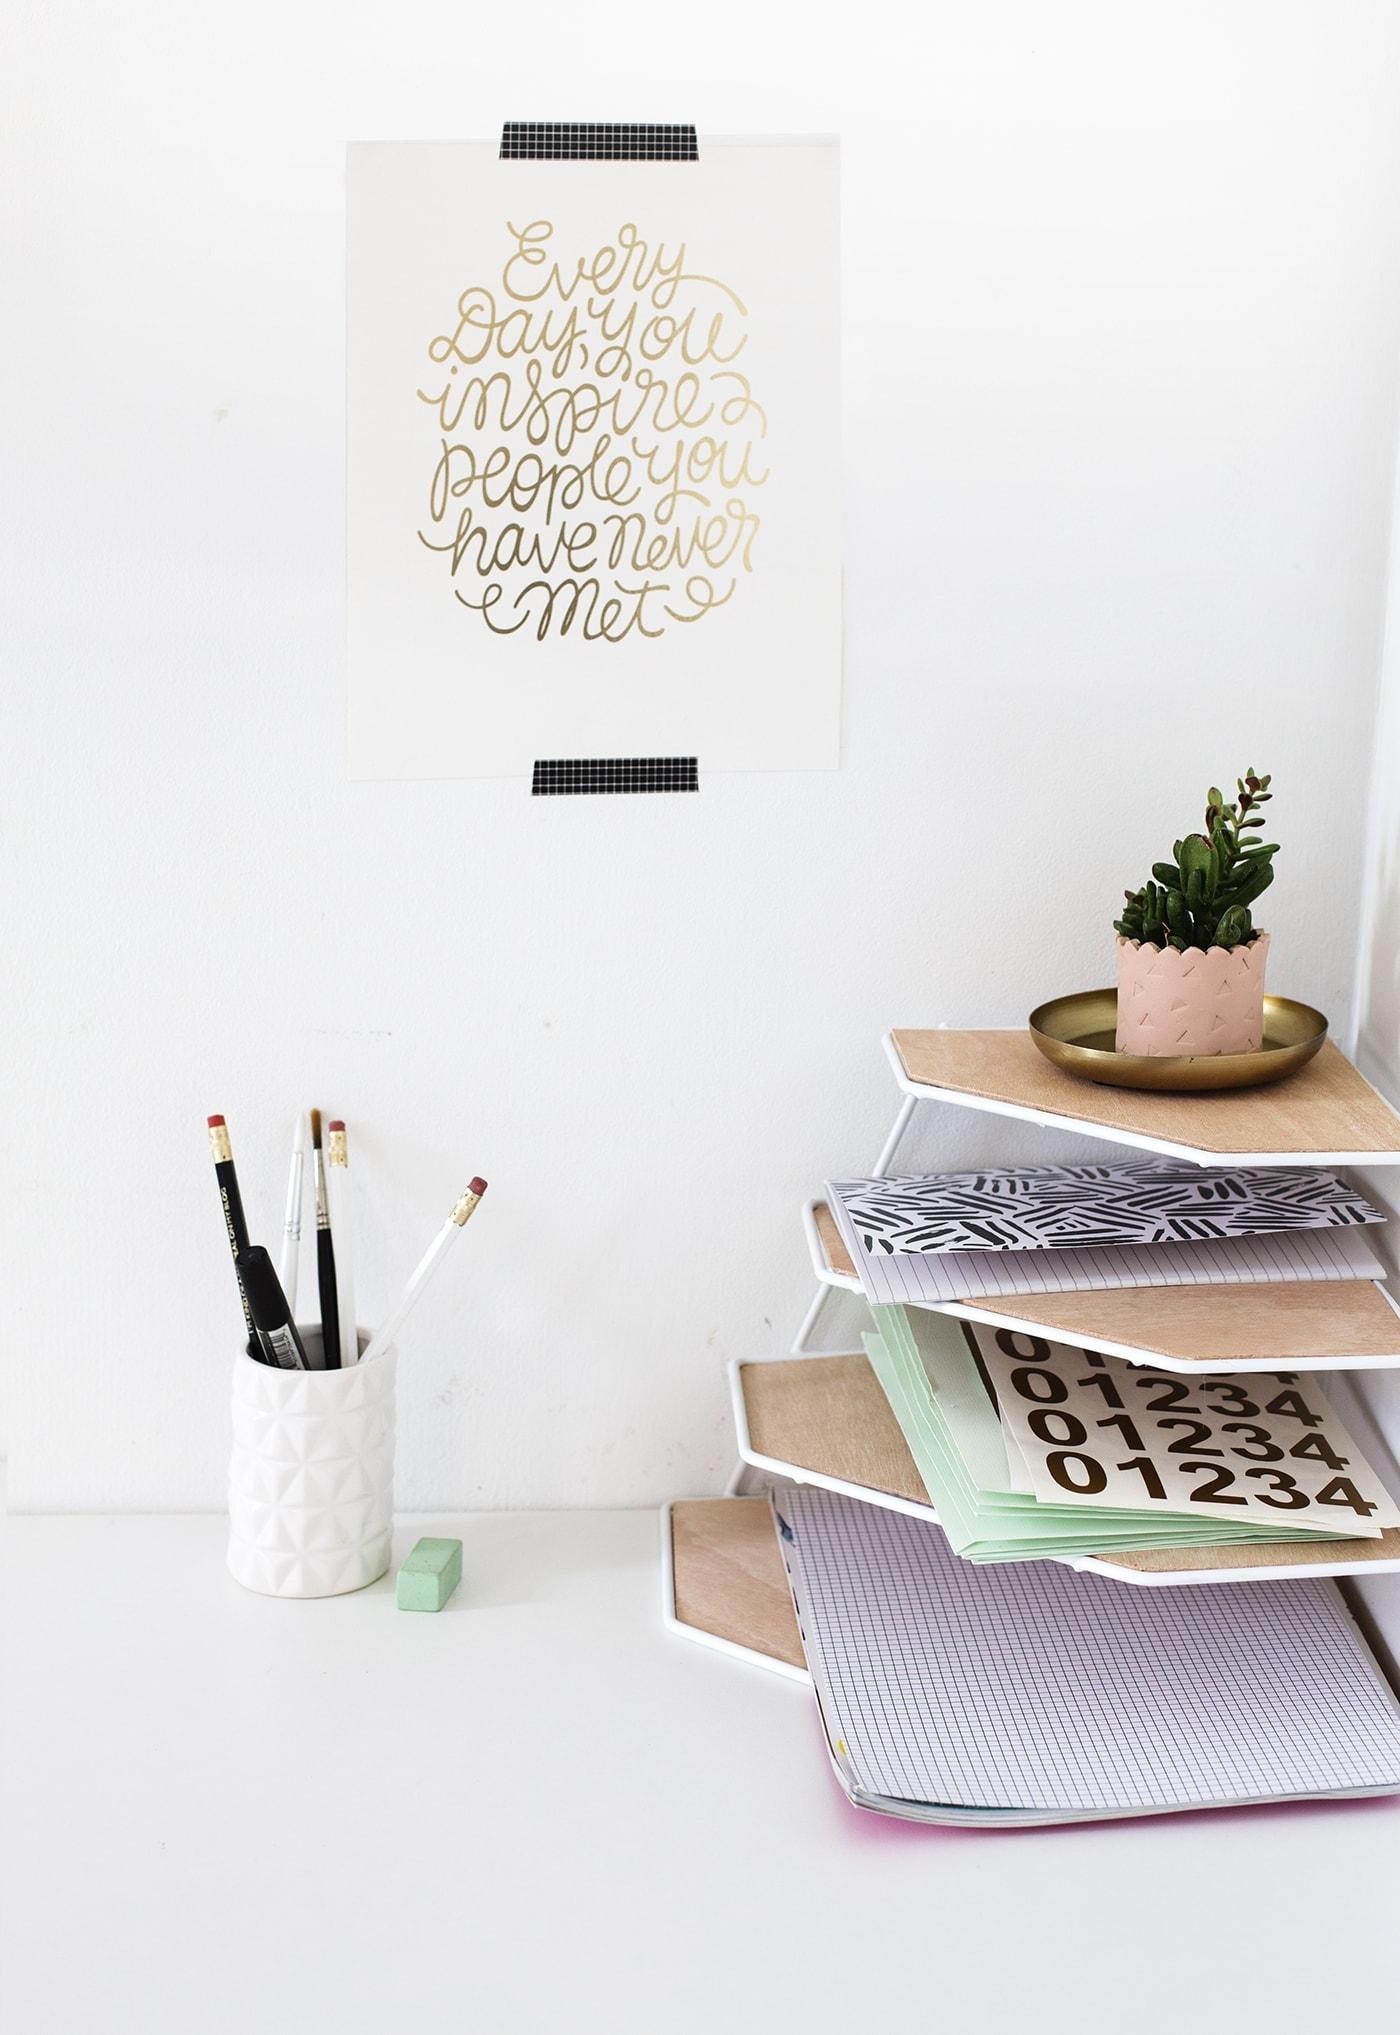 diy-balsa-wood-desk-organiser-workspace-tidy-up-easy-craft-ideas